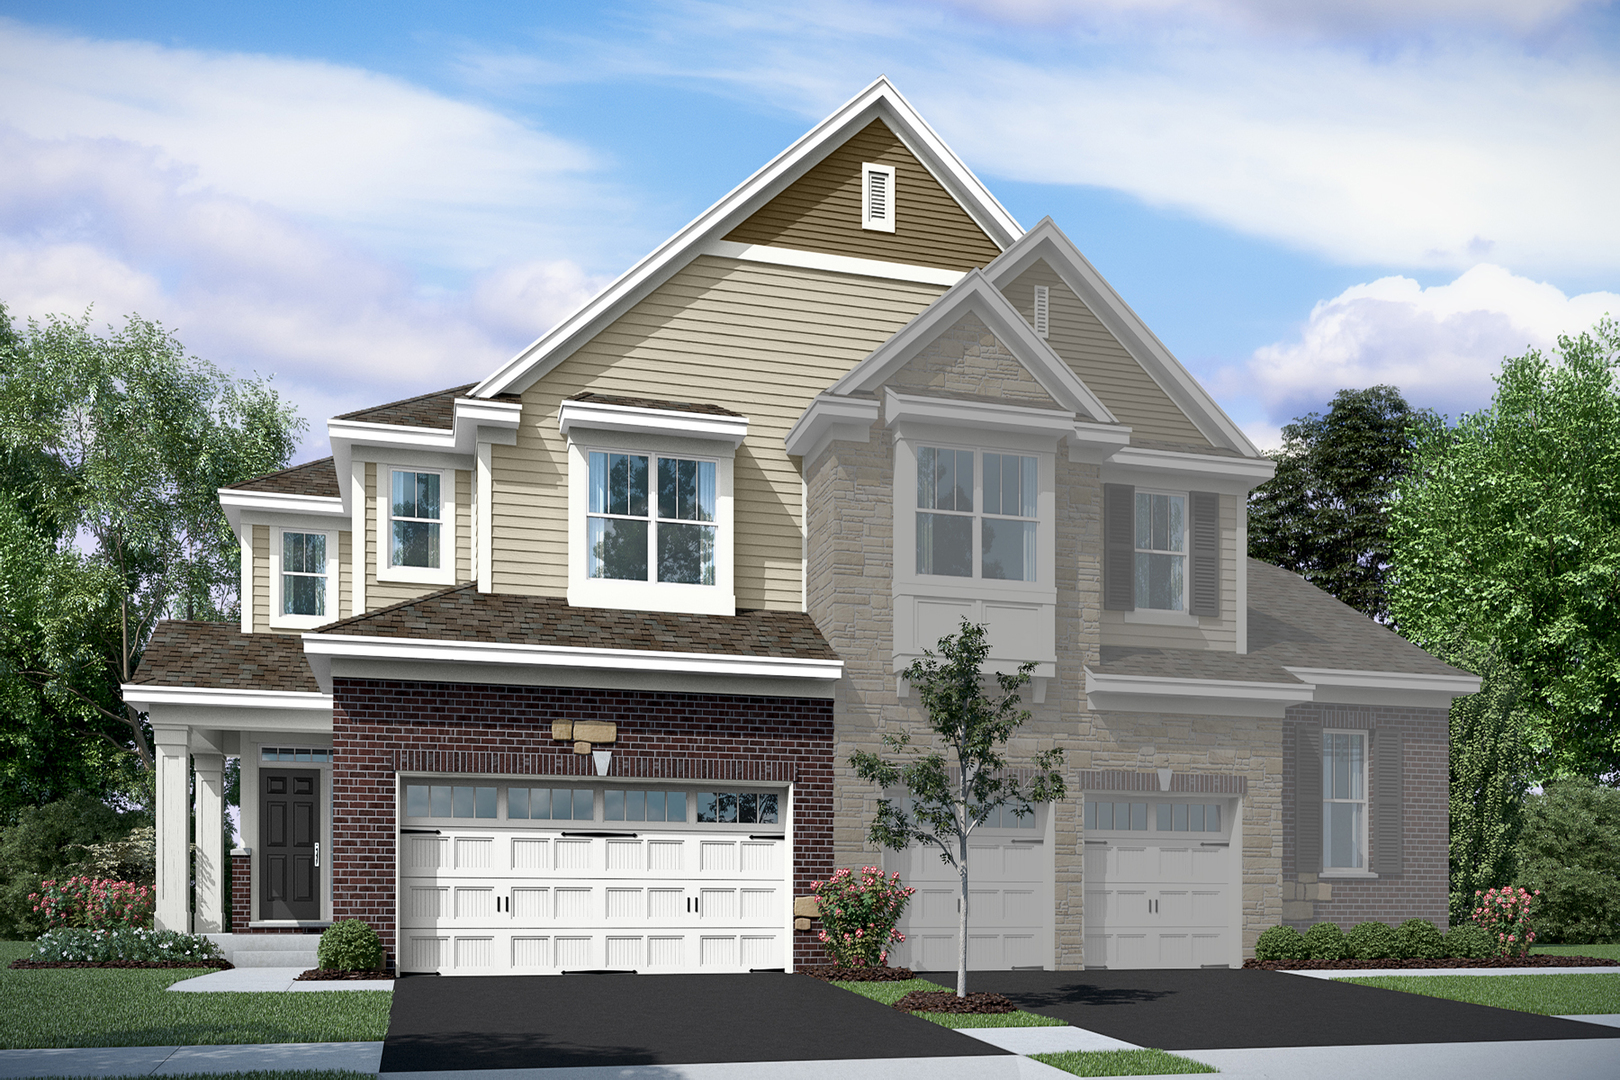 23099 N Pinehurst Lot # 80.02 Drive, Kildeer, Il 60047